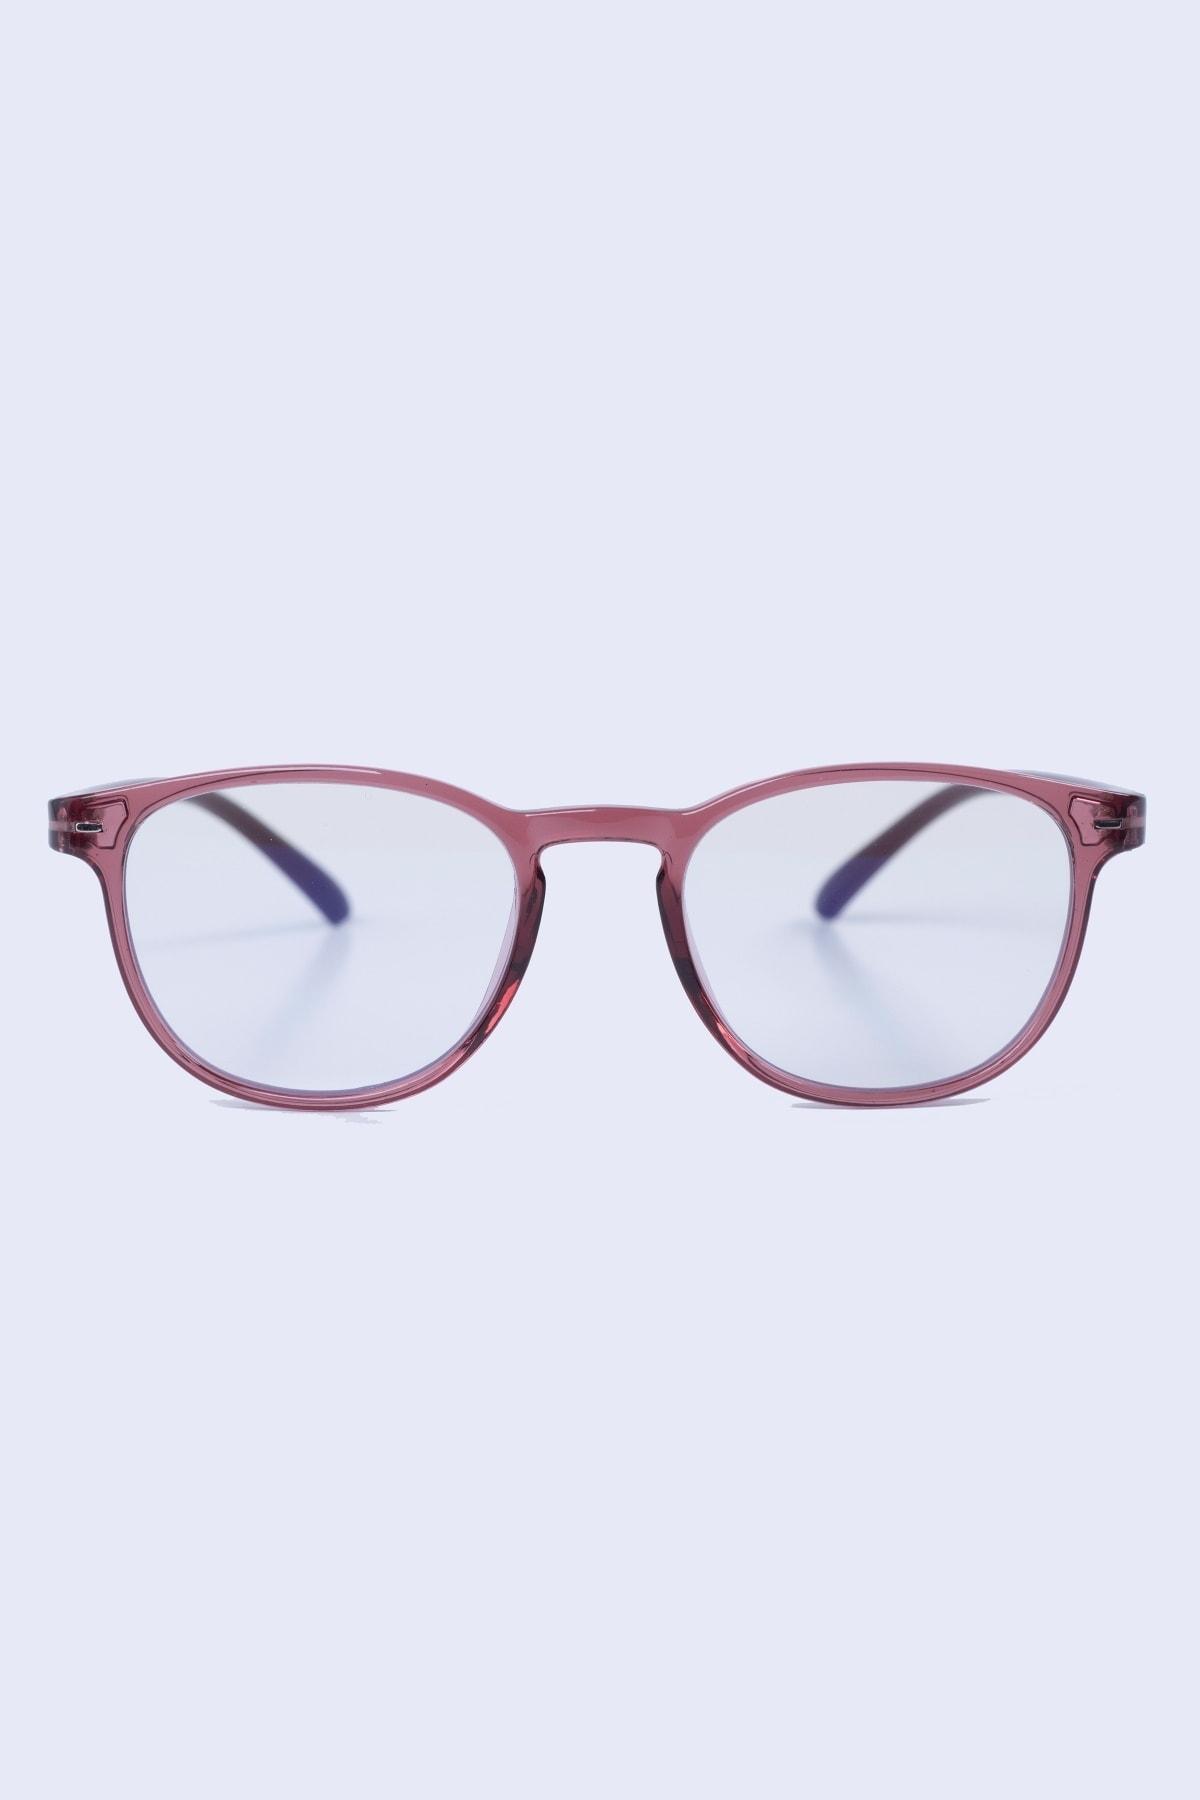 عینک آفتابی بچه گانه پسرانه مدل 2021 برند Focus On Eyewear رنگ صورتی ty65862923